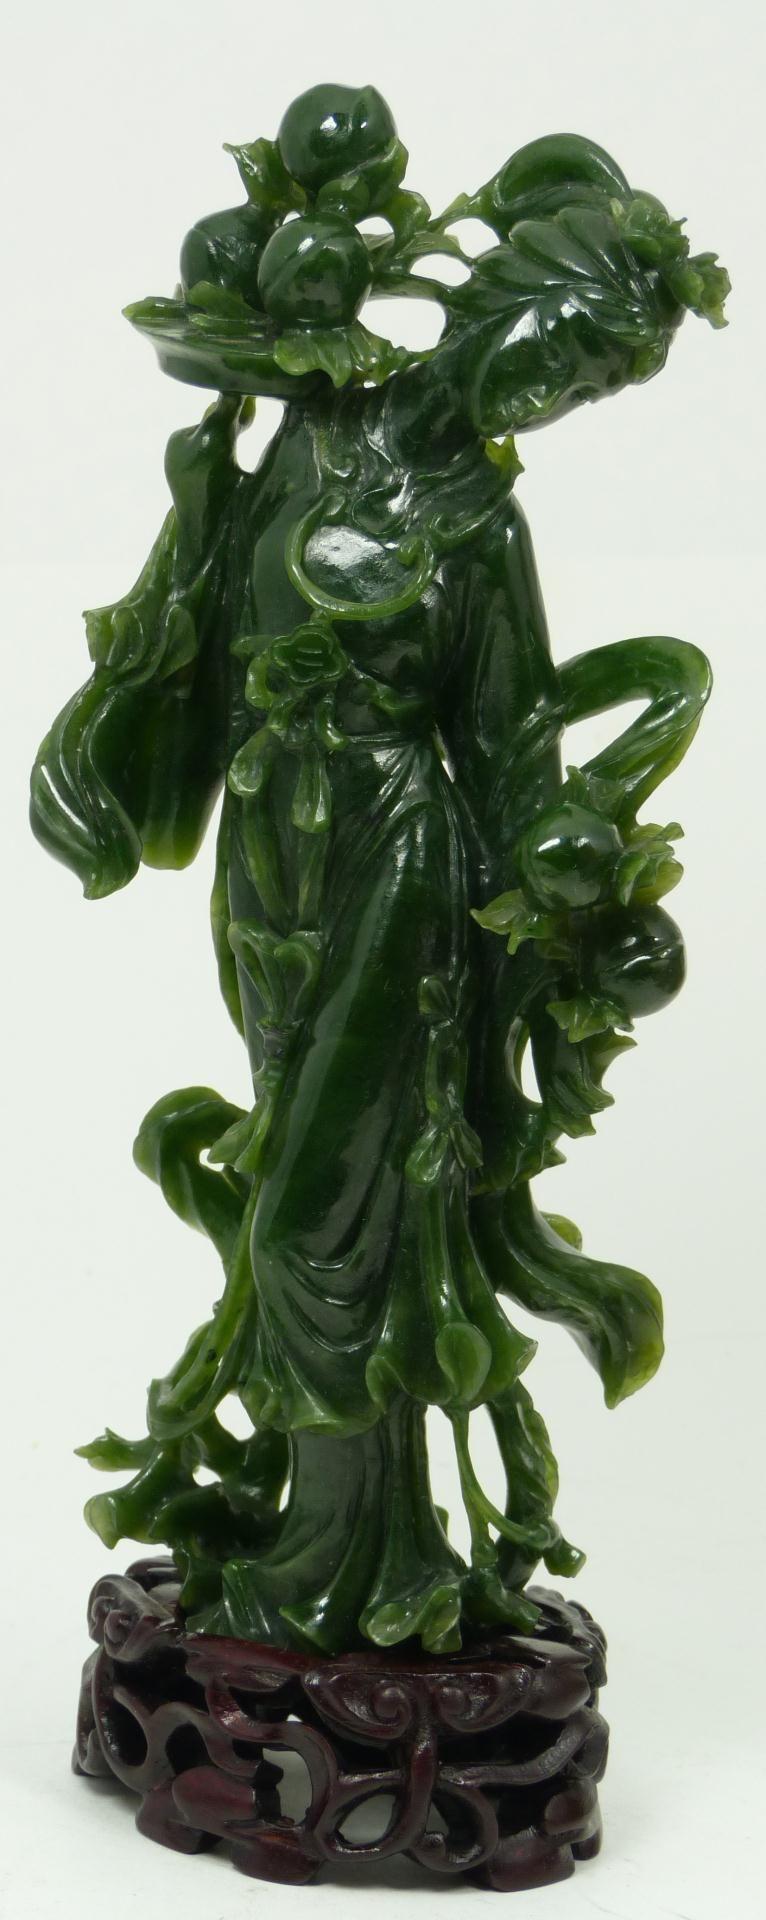 Carved jade figure depicting guan yin holding a platter